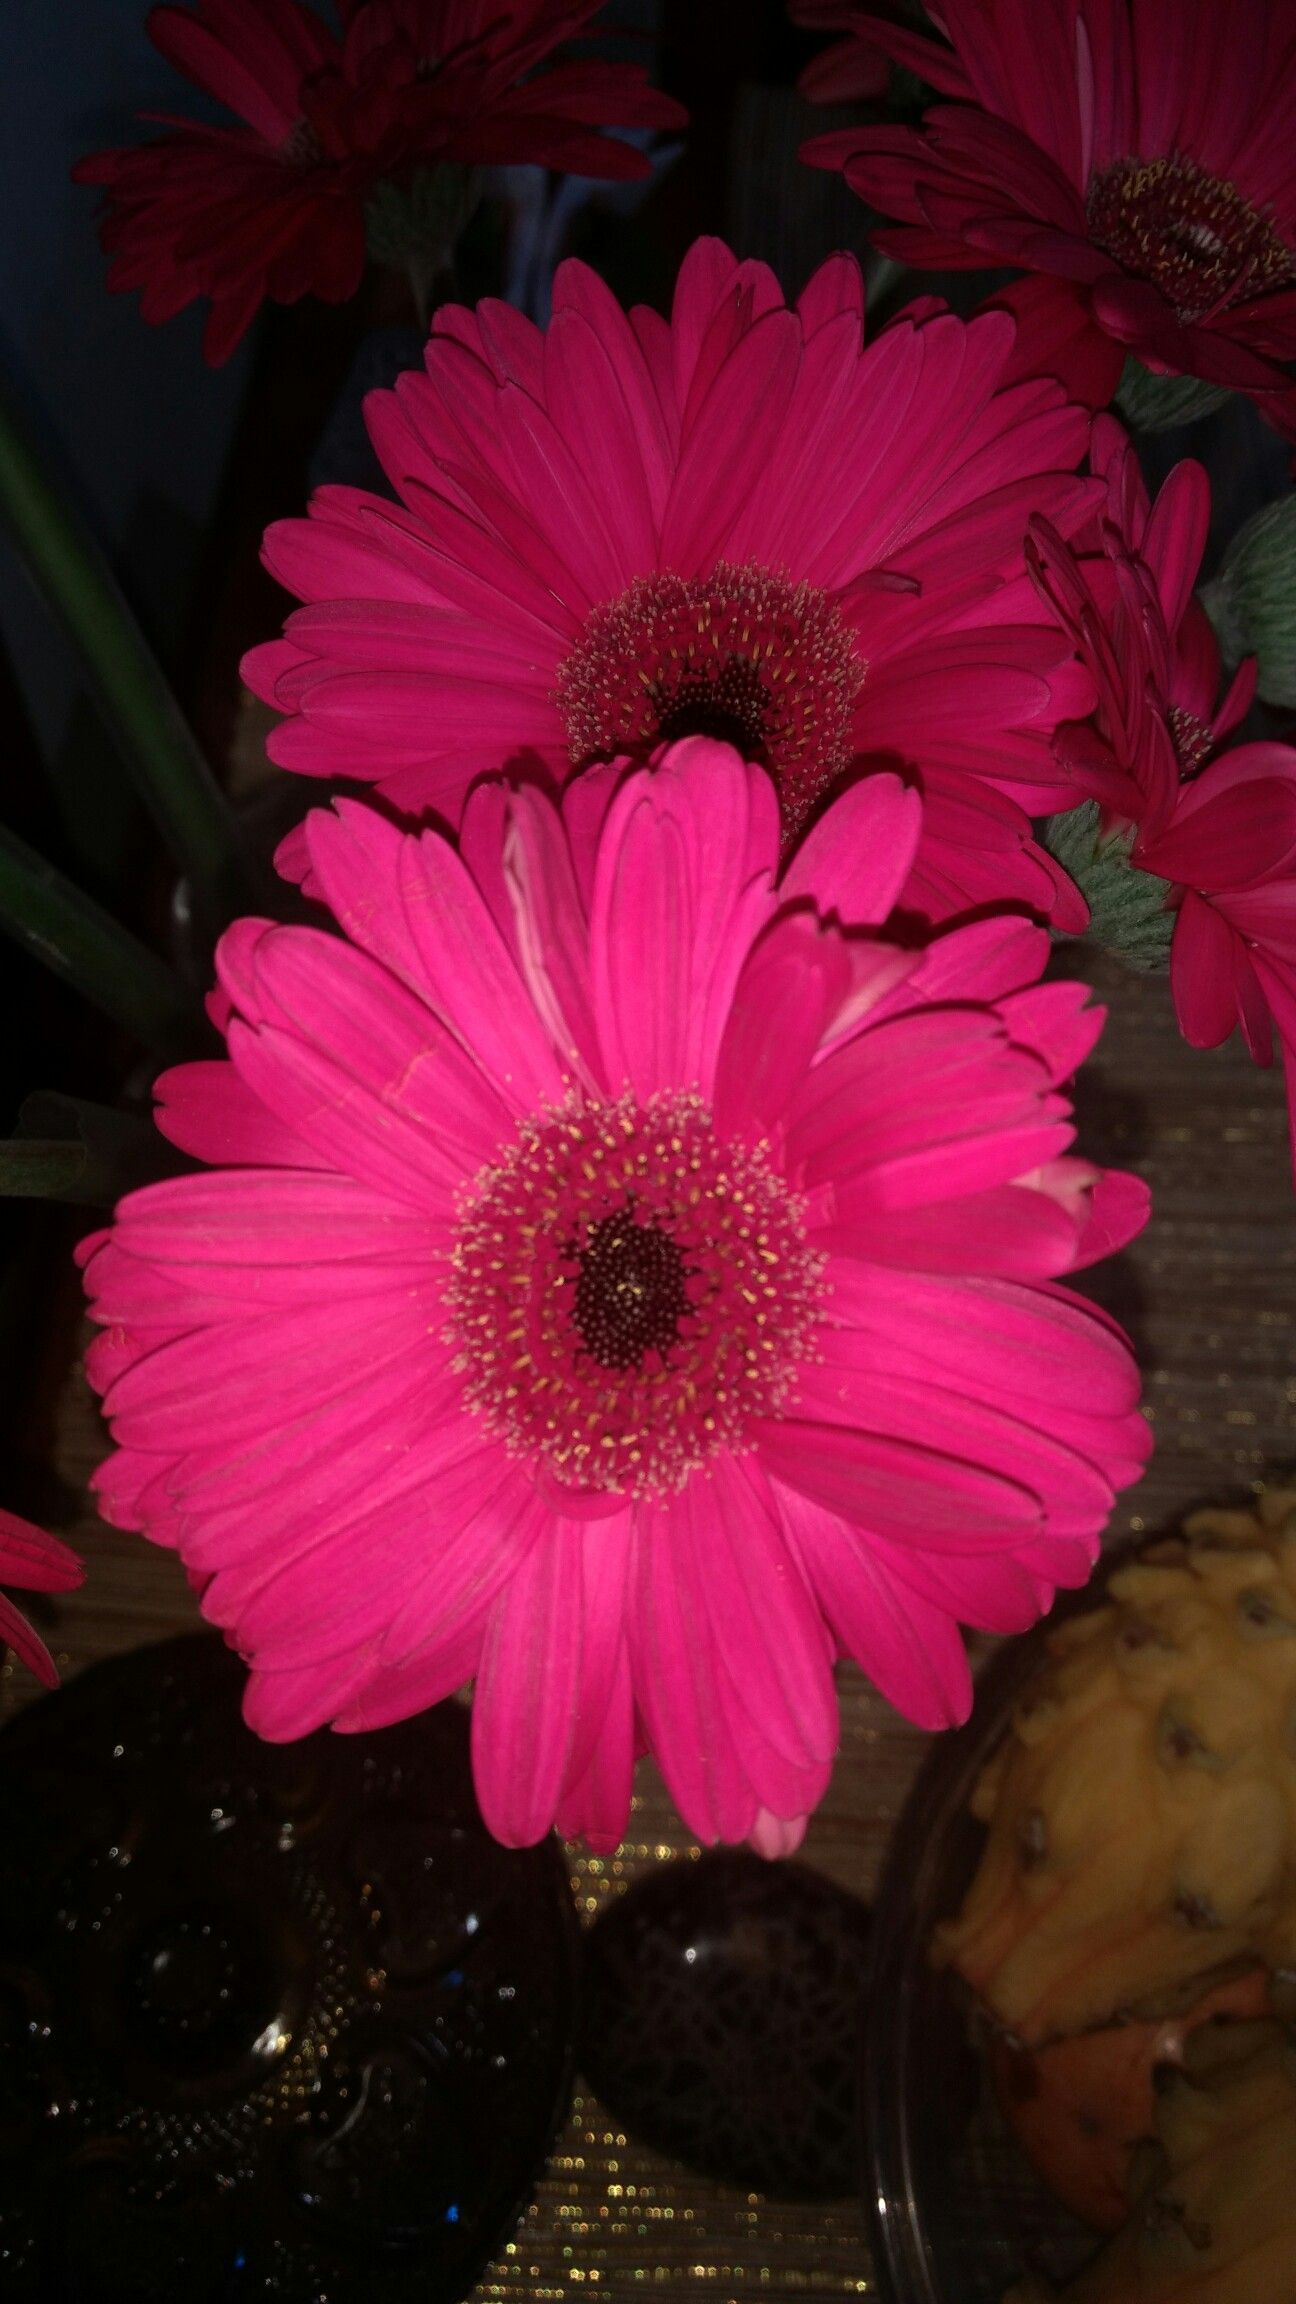 Pin by mercedes salazar on postales pinterest flowers beautiful gerbera daisies beautiful scenery beautiful flowers flower power natural beauty daisy perfume wellness bouquet izmirmasajfo